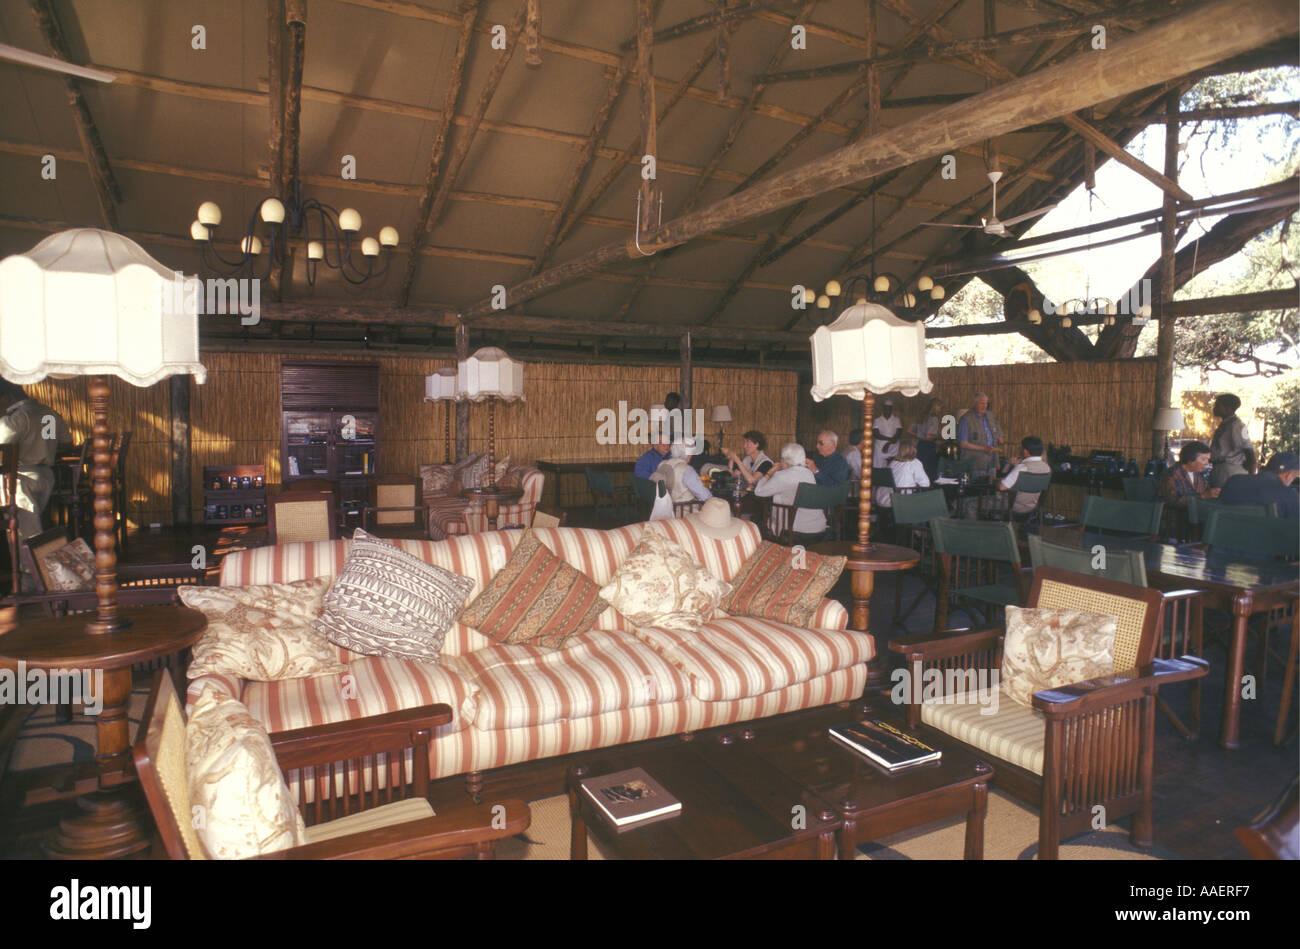 Dining and lounge area Savuti Elephant Camp Okavango Delta Botswana southern Africa - Stock Image